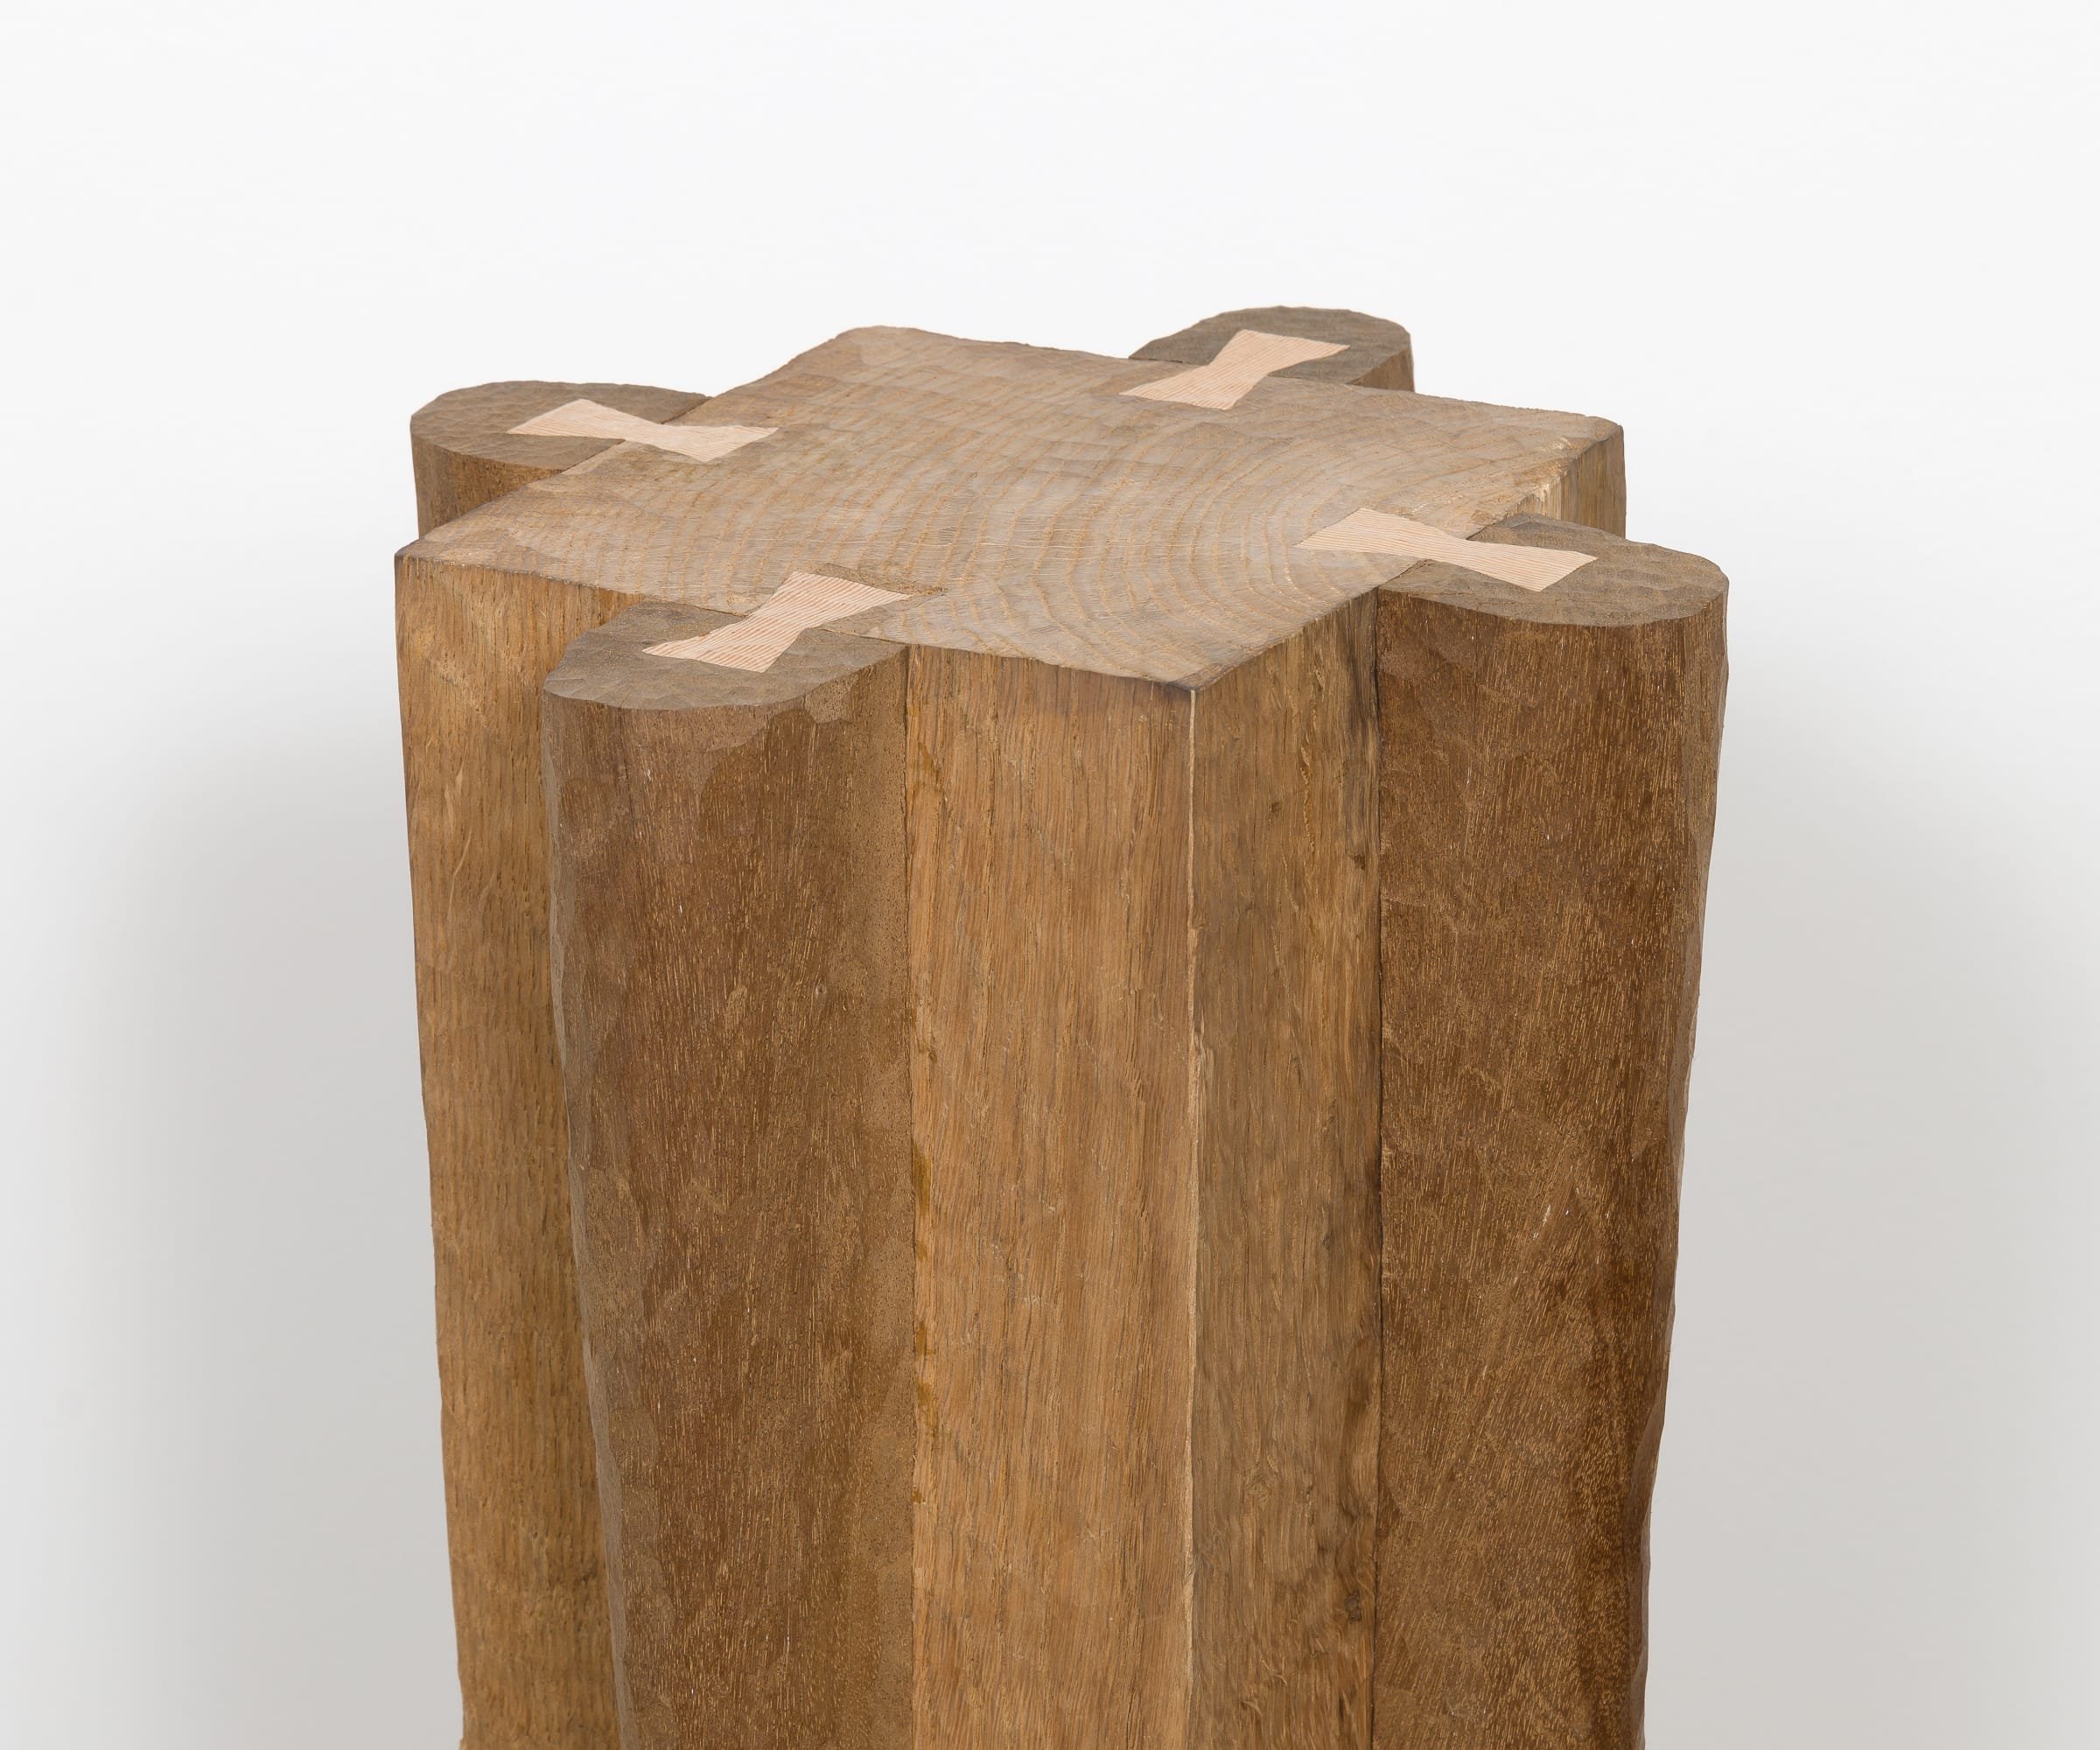 Tonico Lemos Auad at Biennale Gherdëina VII Curated by Adam Budak (Chief Curator National Gallery, Prague)